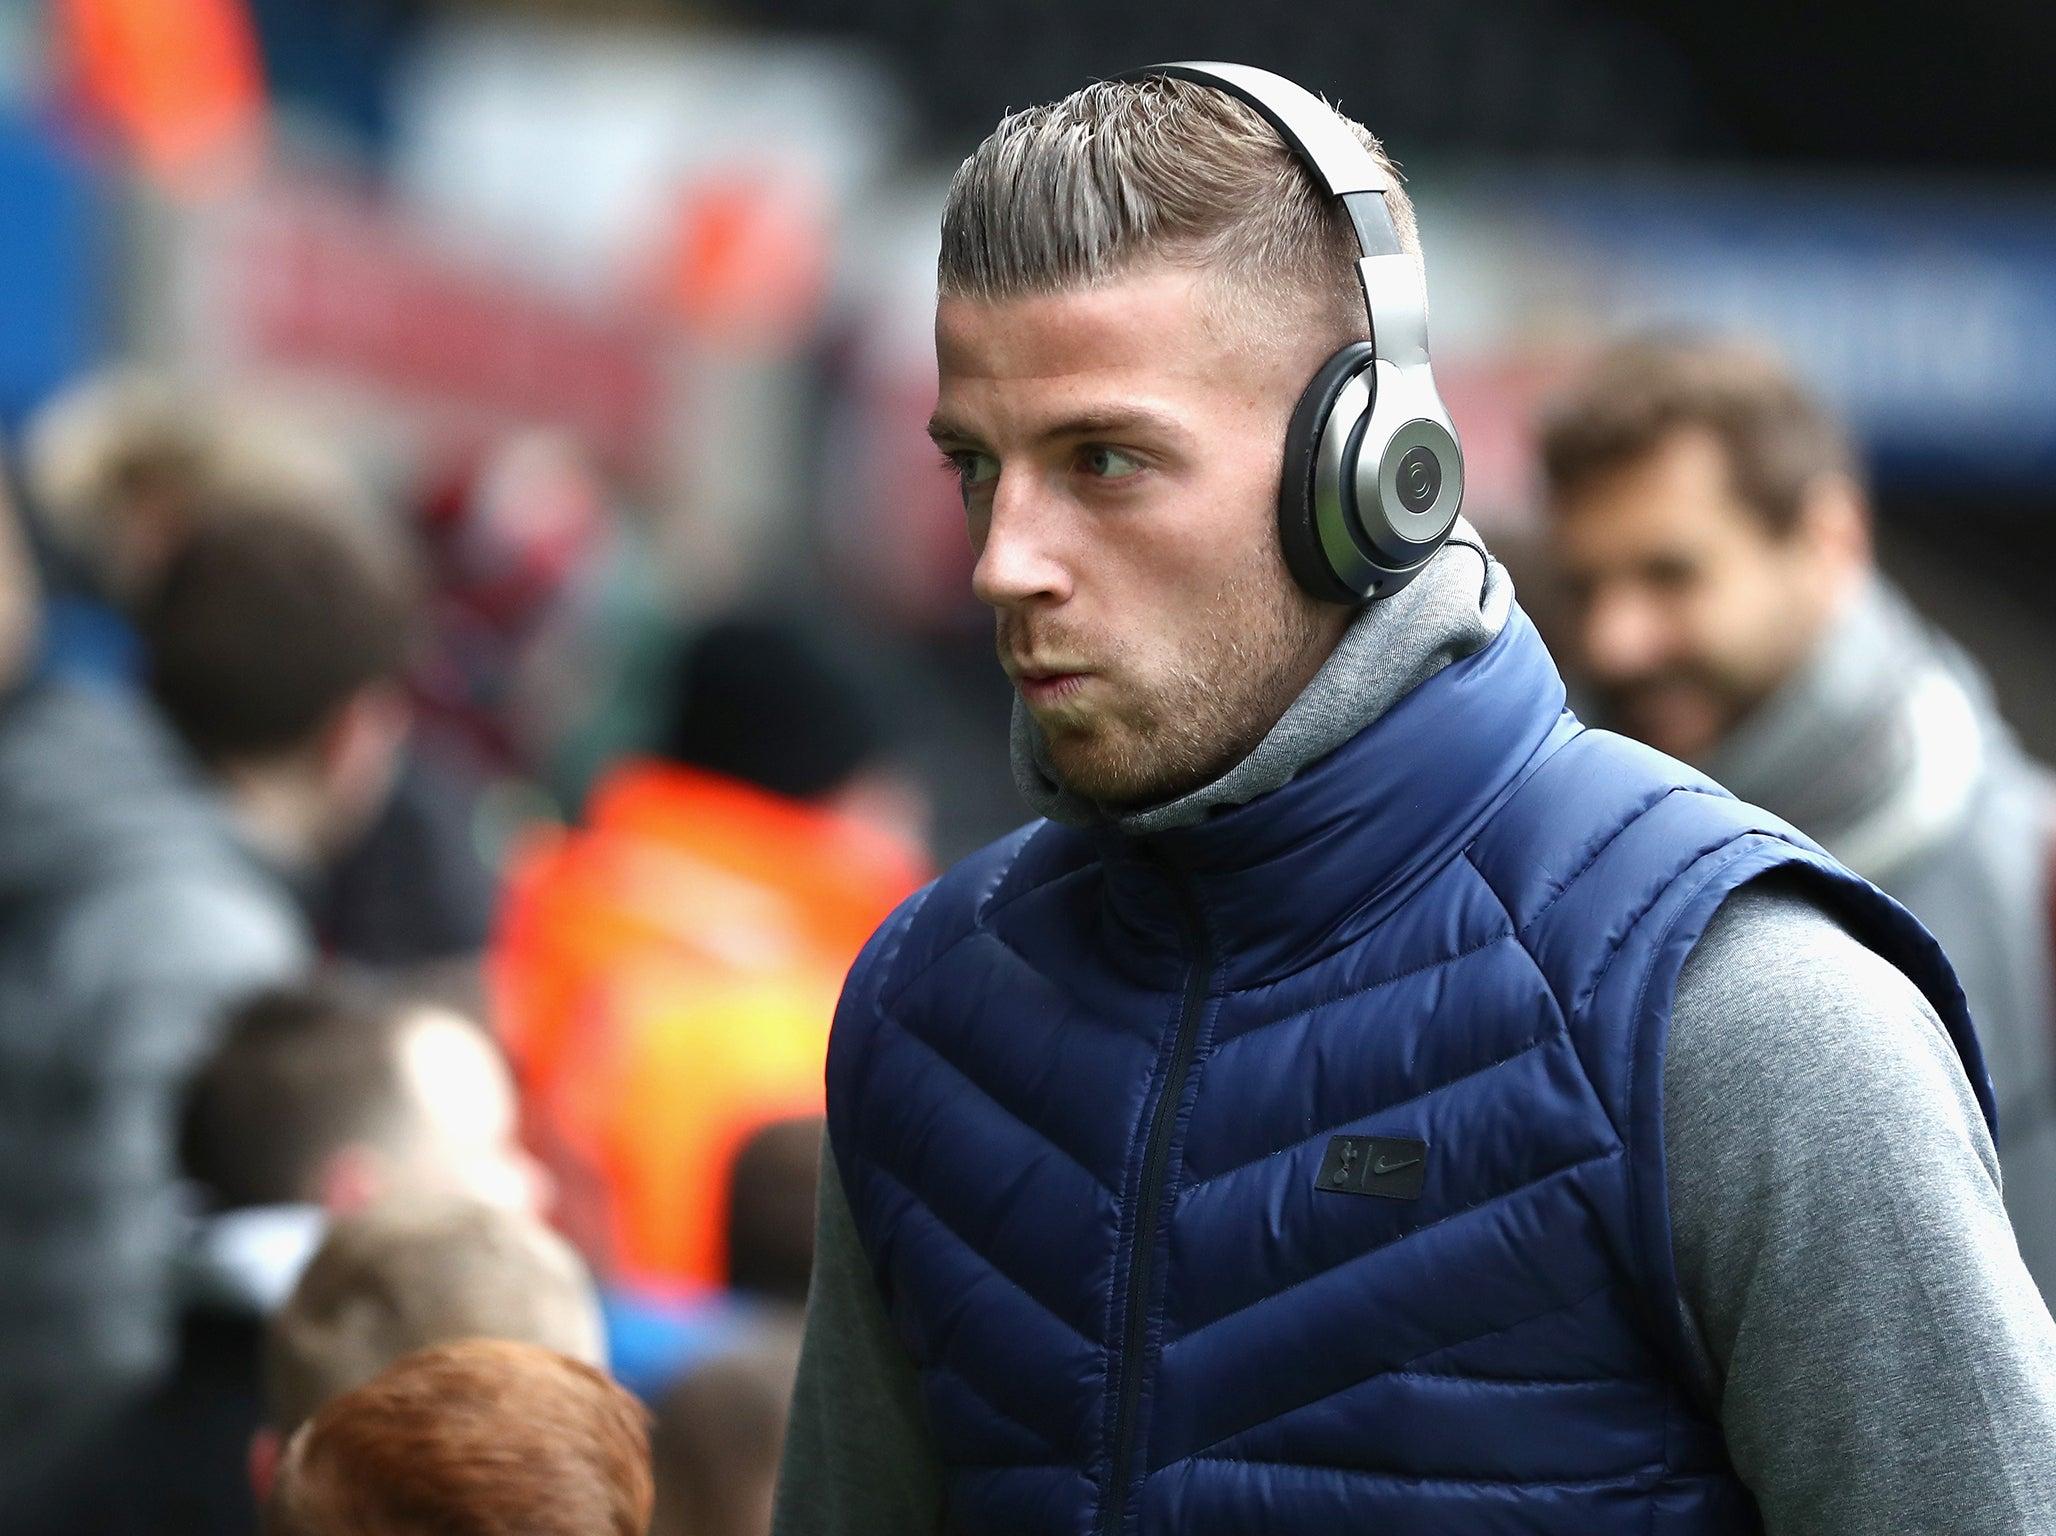 Tottenham transfer news: Toby Alderweirld says World Cup 2018 displays prove Spurs snub was unfair